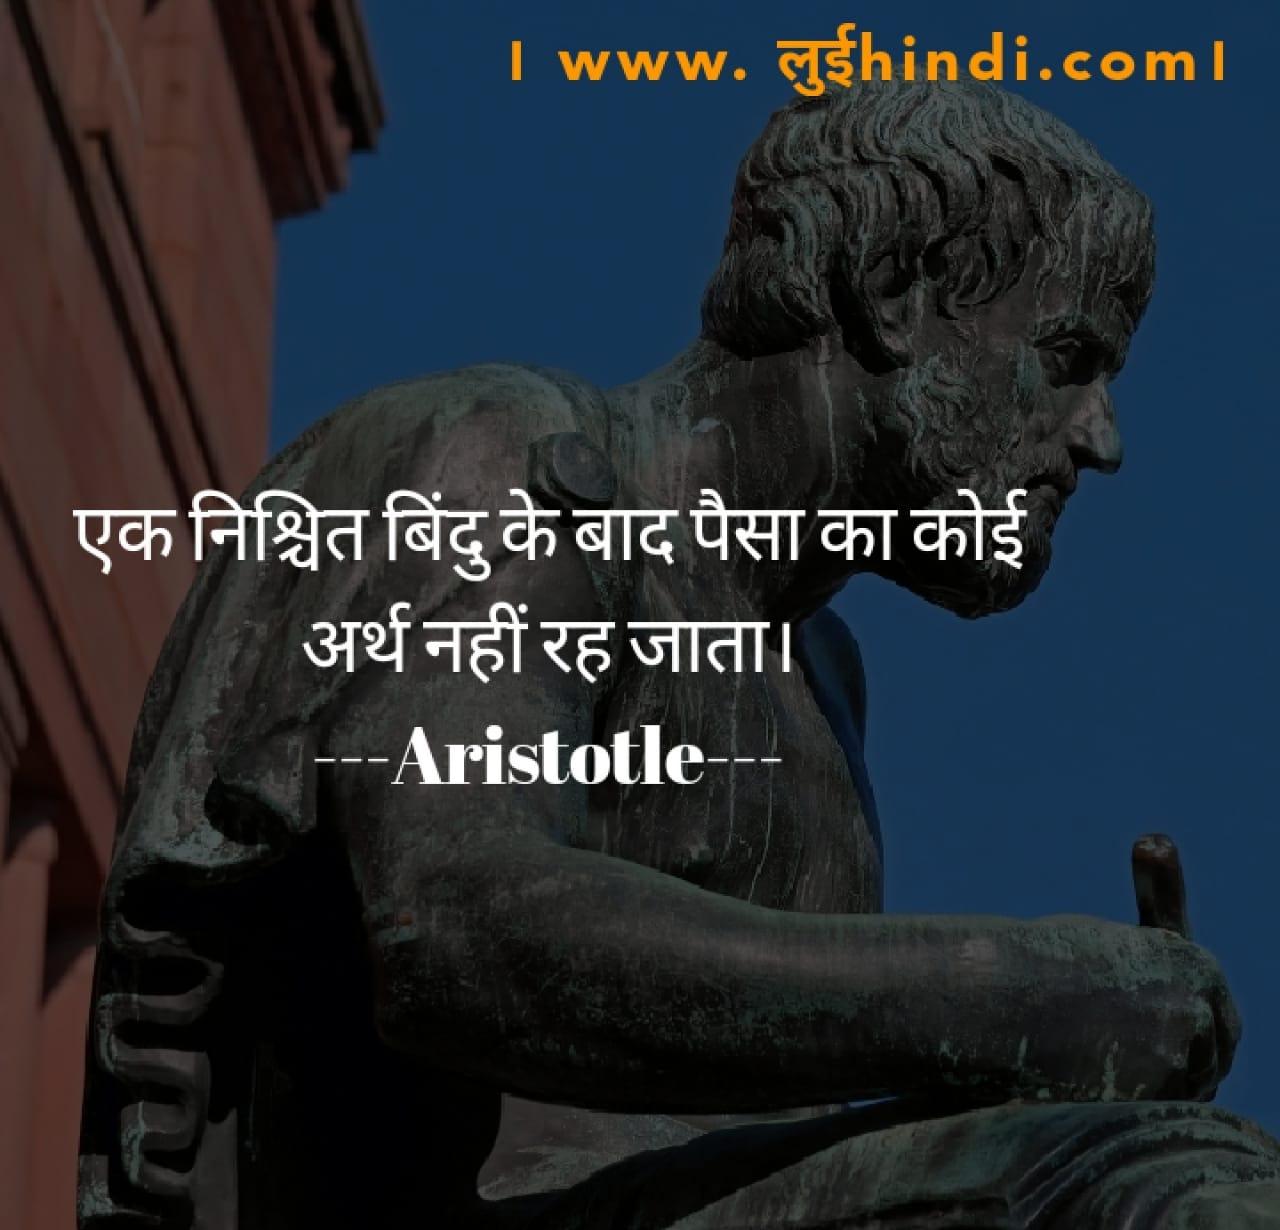 Aristotle quotes in hindi -www.luiehindi.com